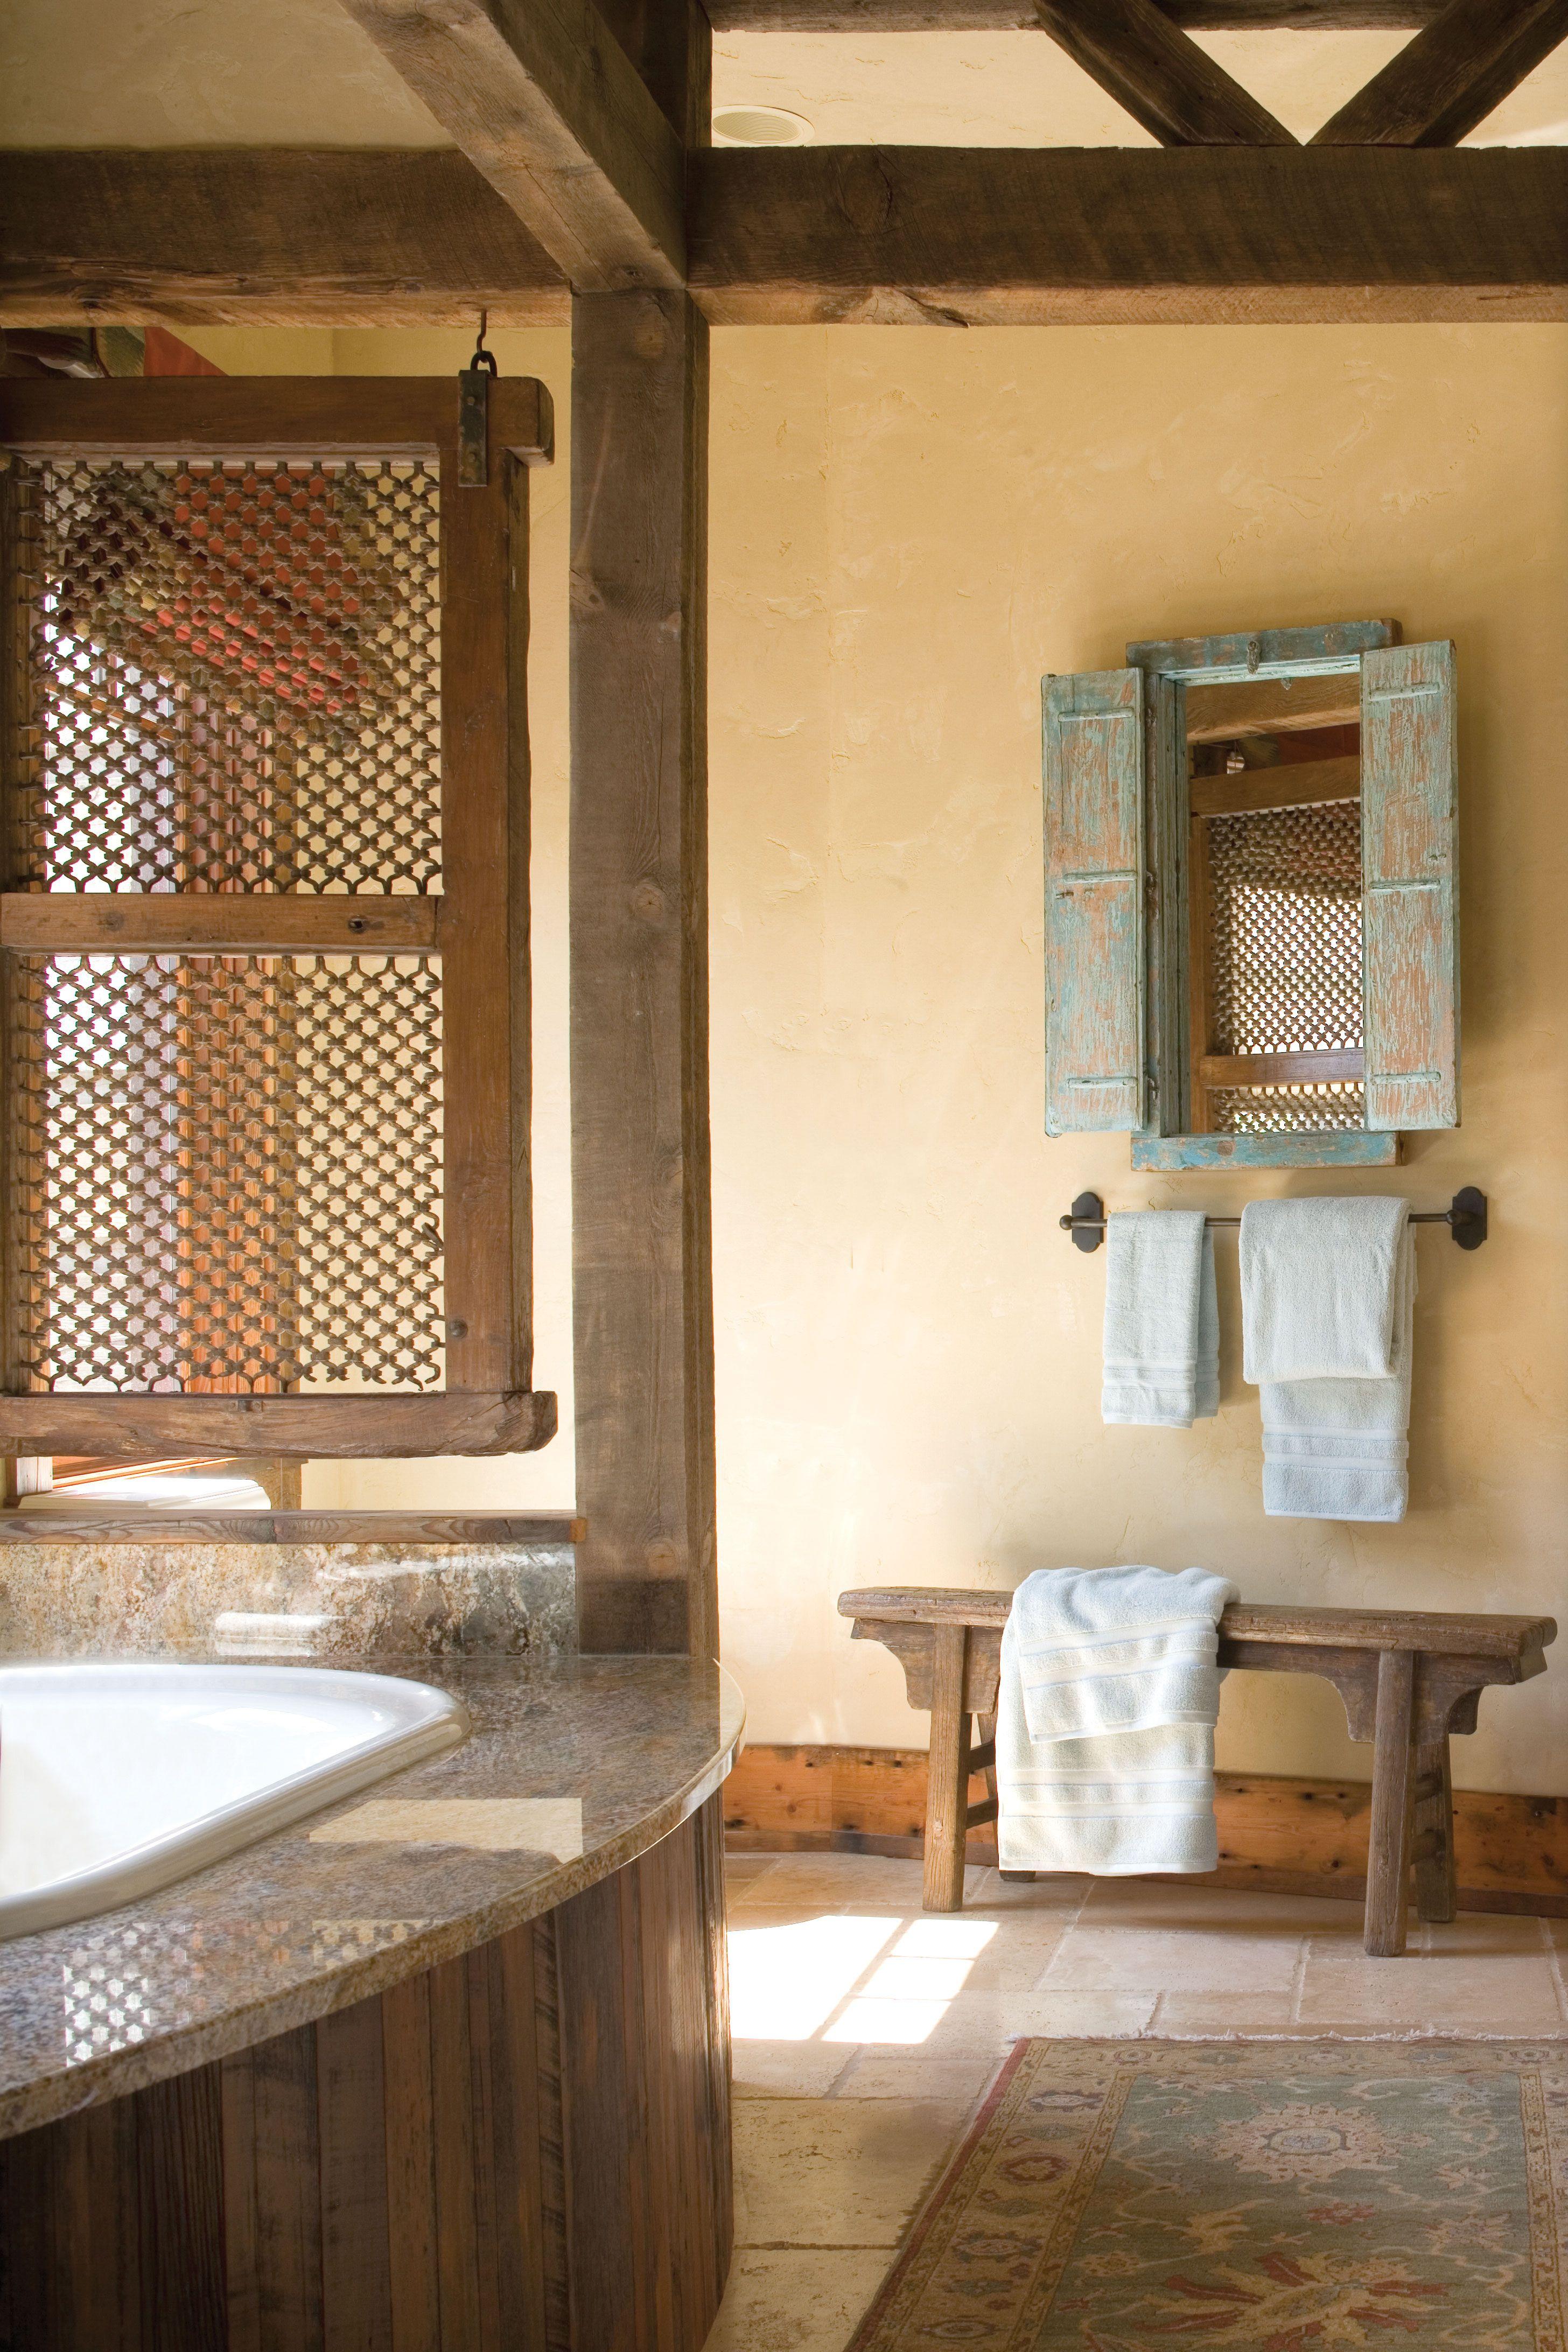 Southwestern Western Style Less Rustic More Clean Rustic Bathroom Decor Bathroom Decor Small Country Bathrooms